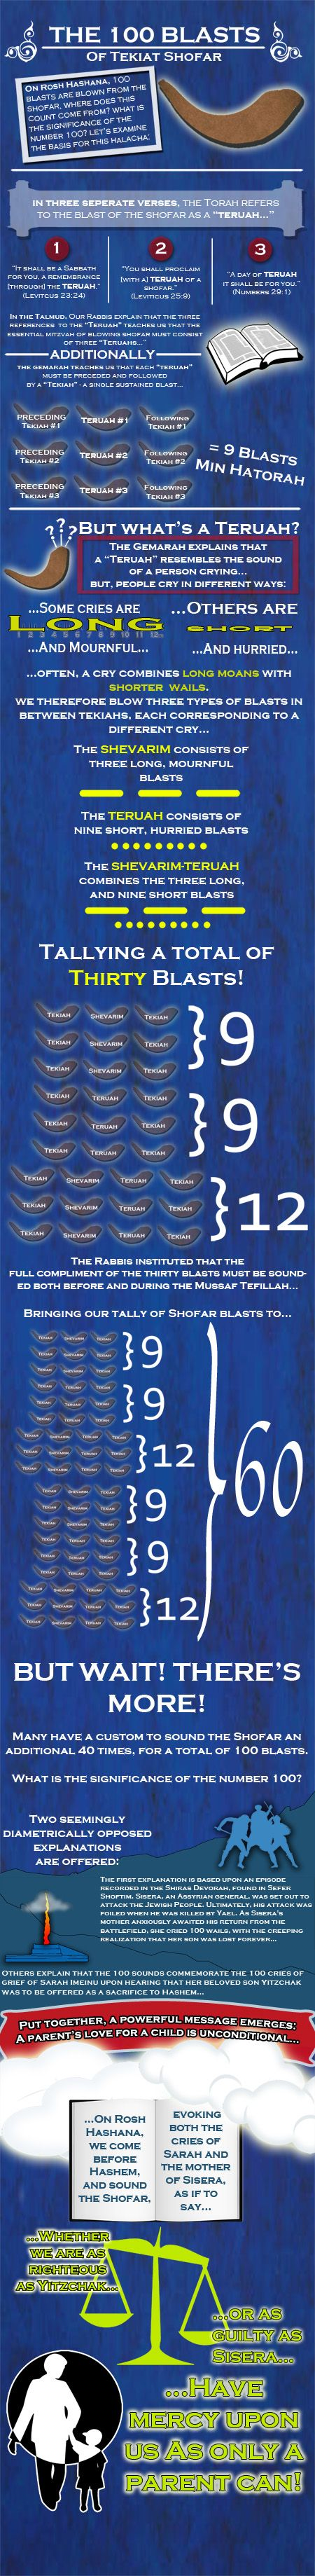 jewish new year in hebrew